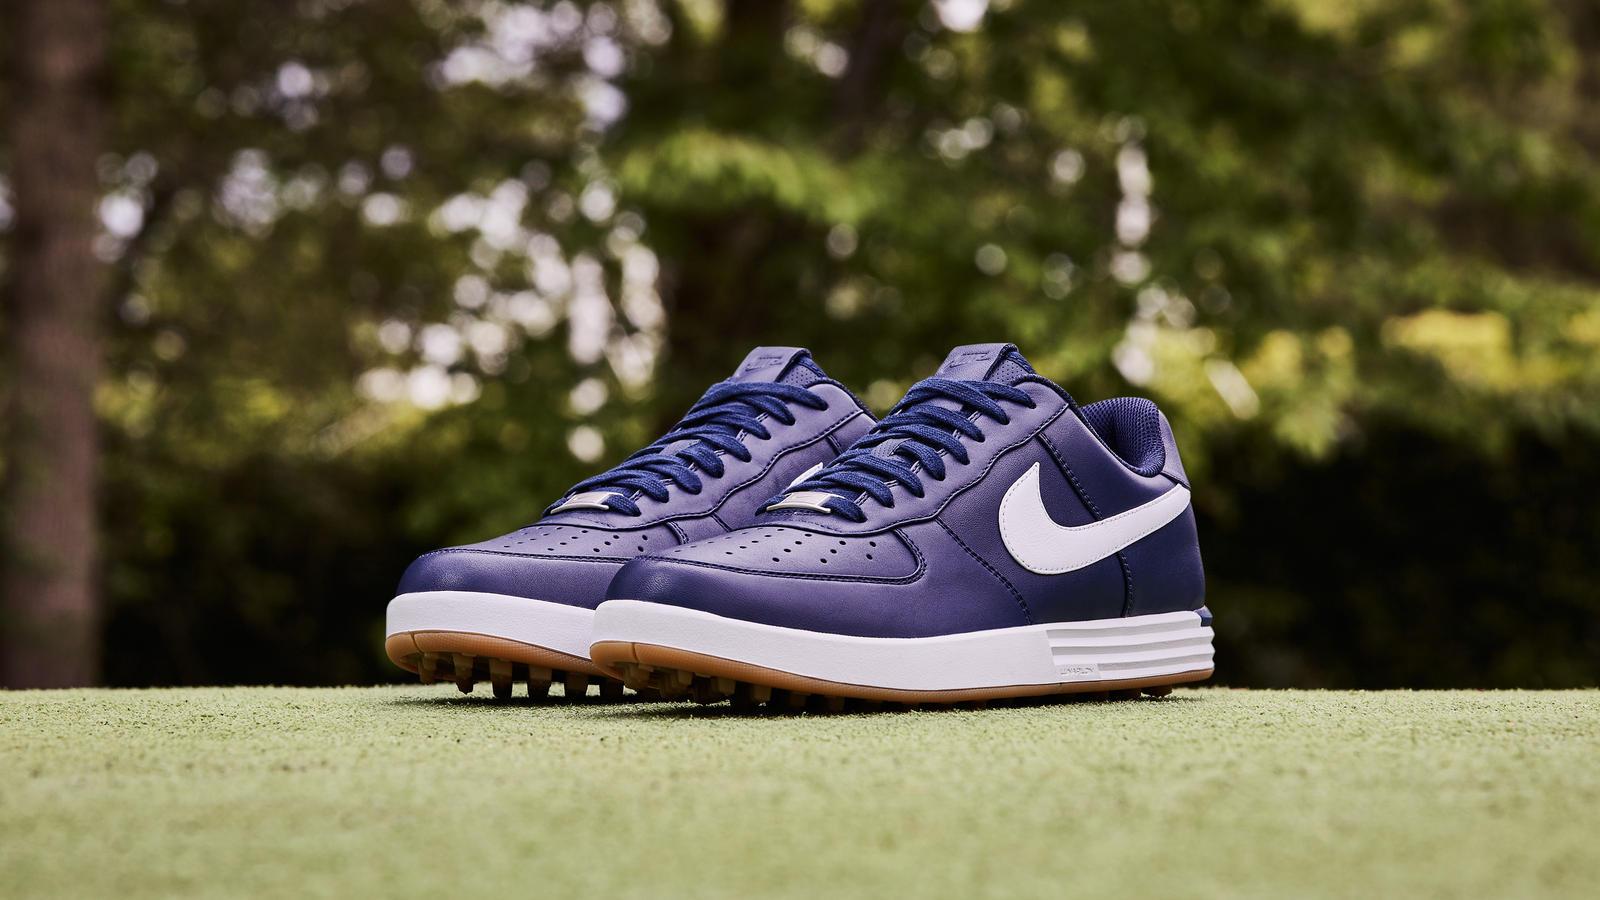 nike air force 1 golf